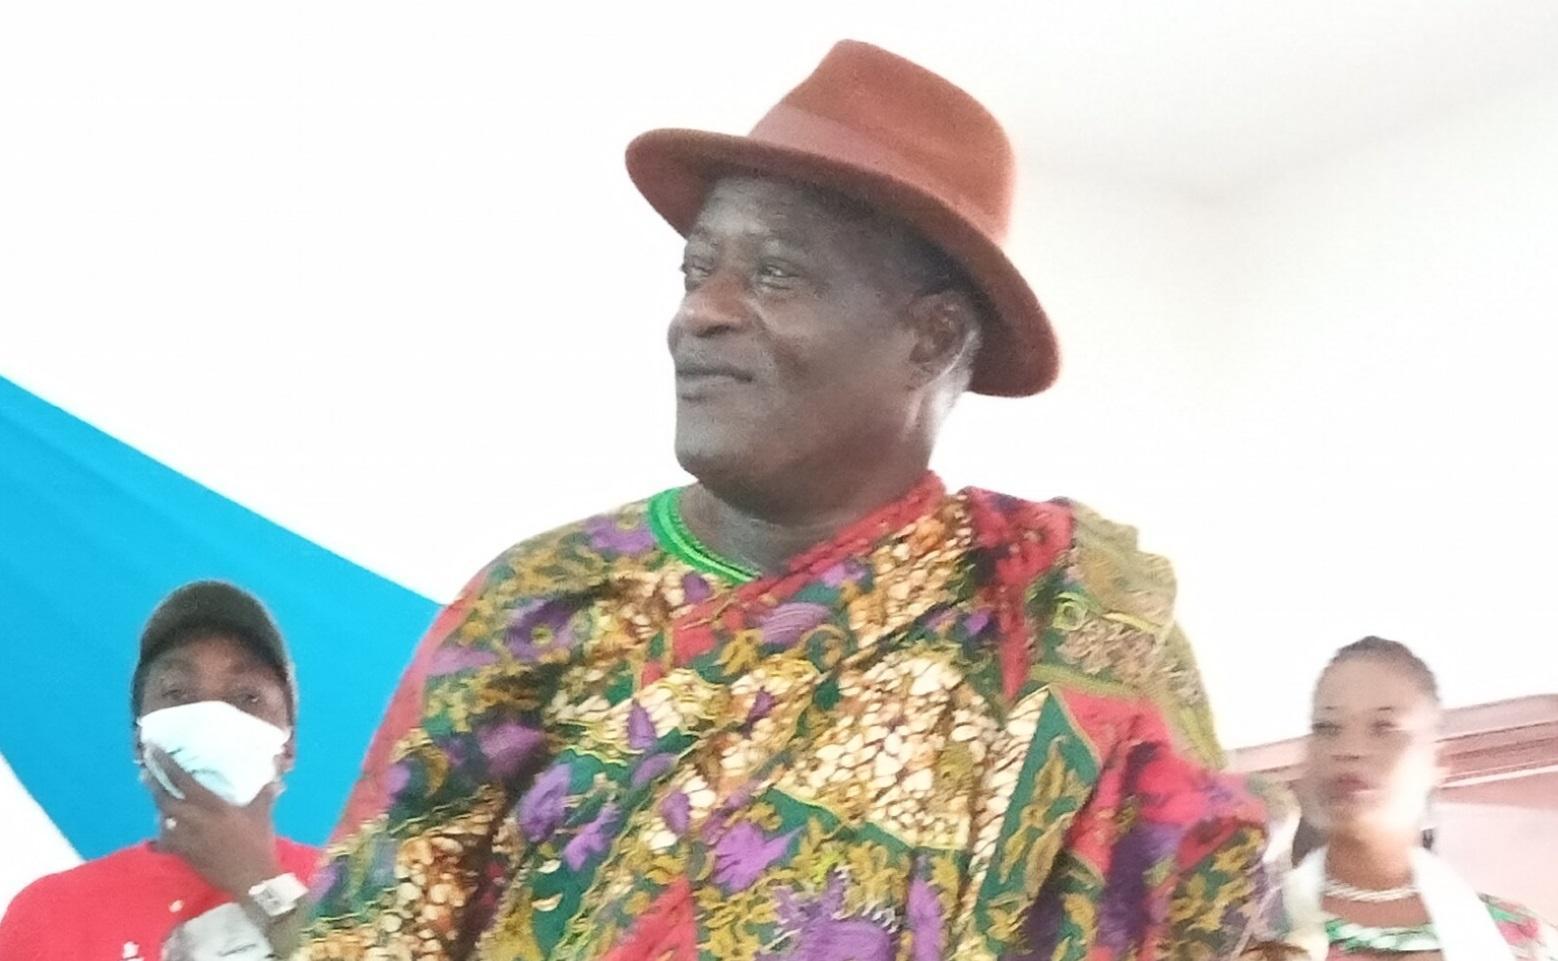 L'ancien maire de Yopougon, Gbamnan Djidan vire dans le camp Gbagbo